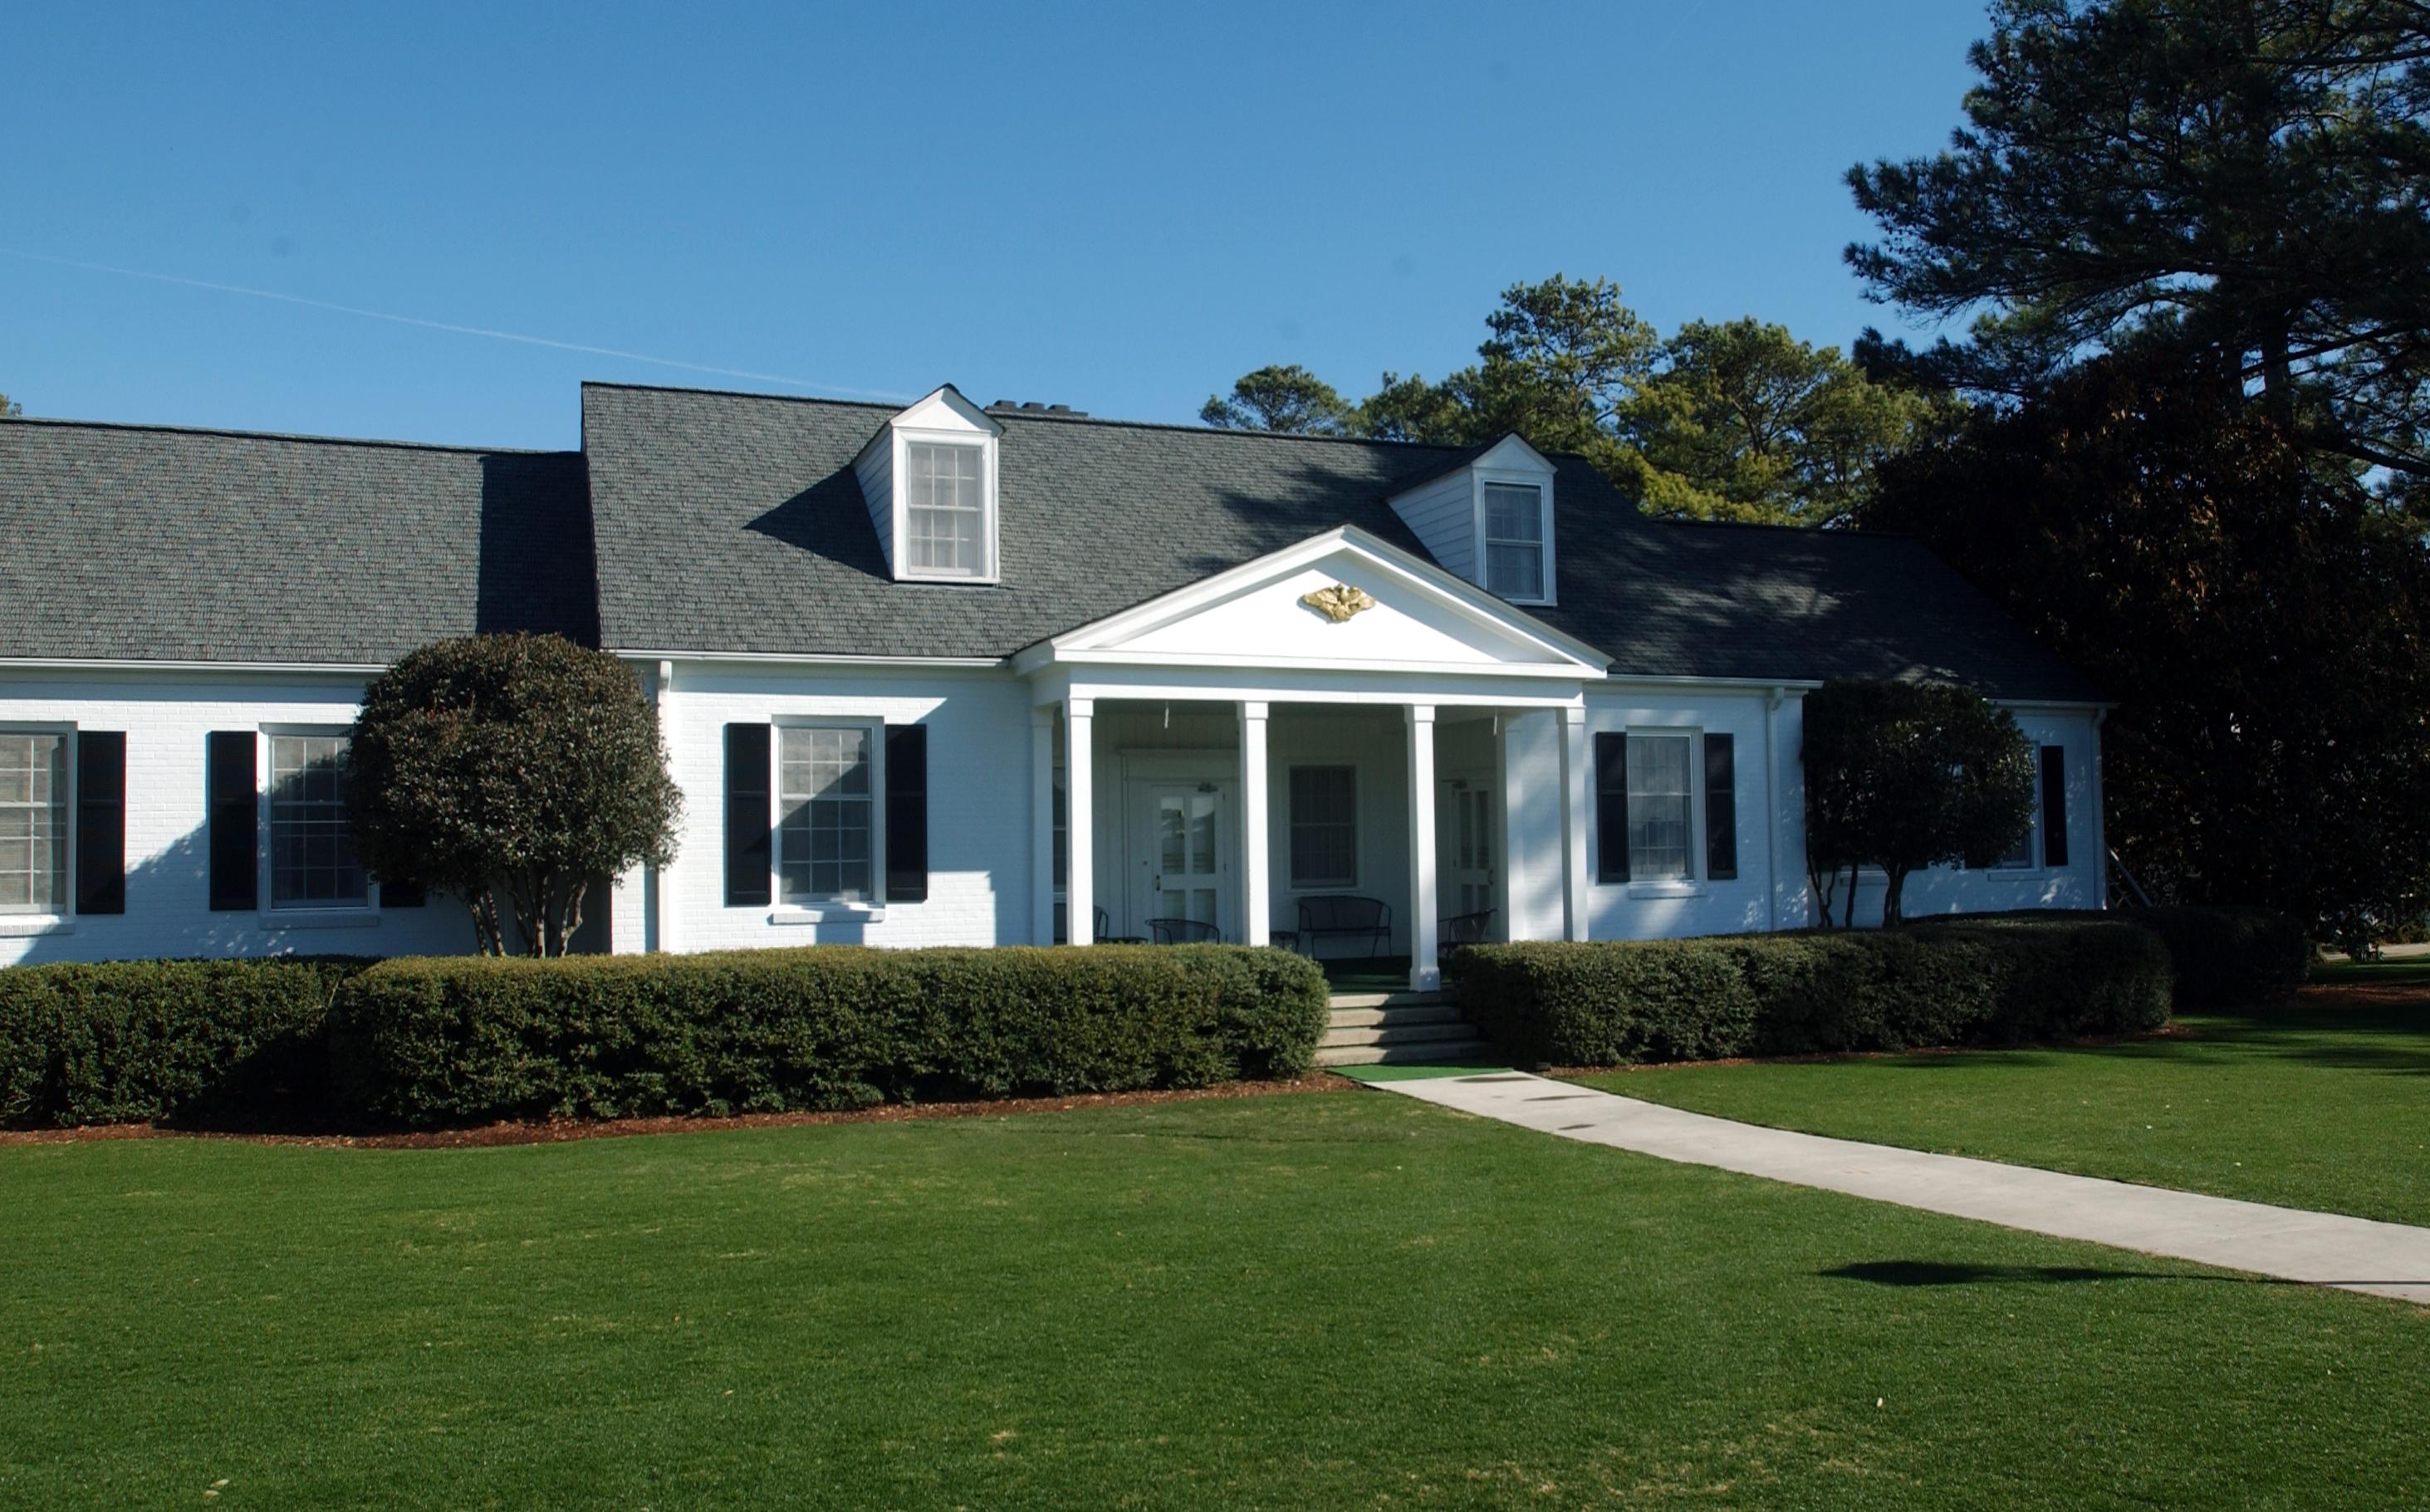 Eisenhower Cabin, named after President Dwight D. Eisenhower, is undergoing an extensive restoration at Augusta National Golf Club. [FILE/STAFF]